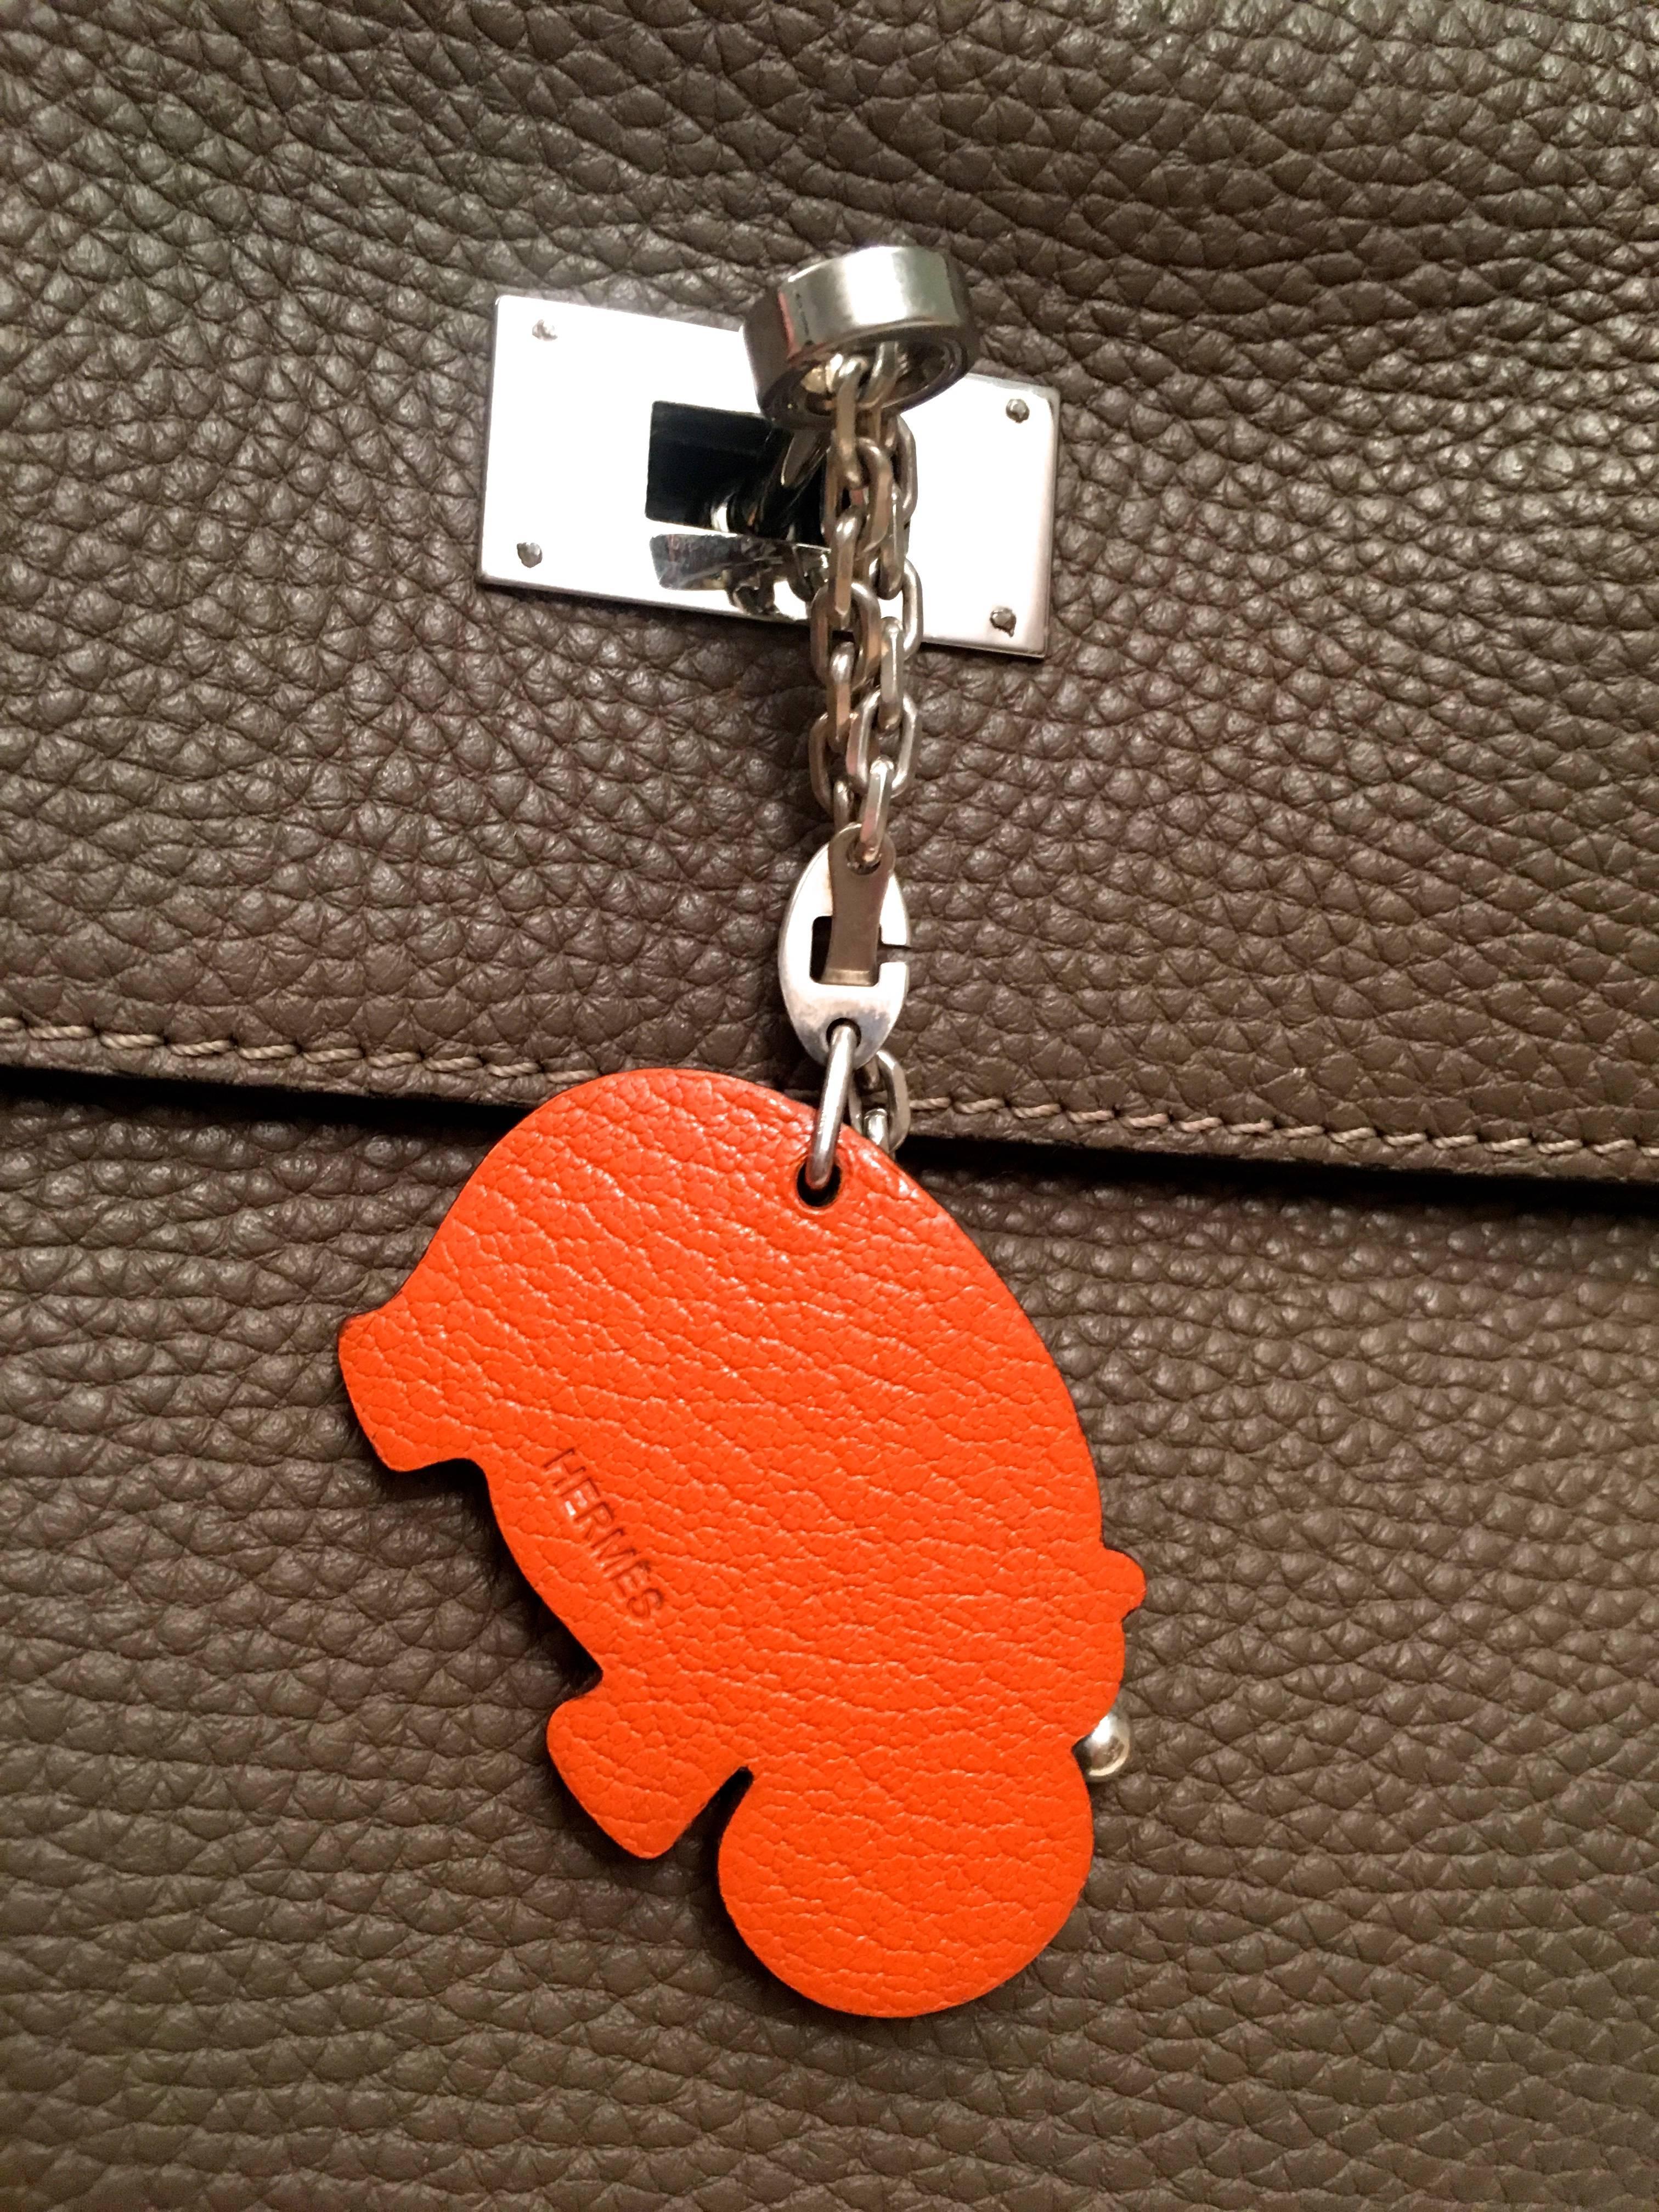 Hermès Hermes Charm / Keychain - Hippopotamus - Sterling Silver / Leather jFcEY4